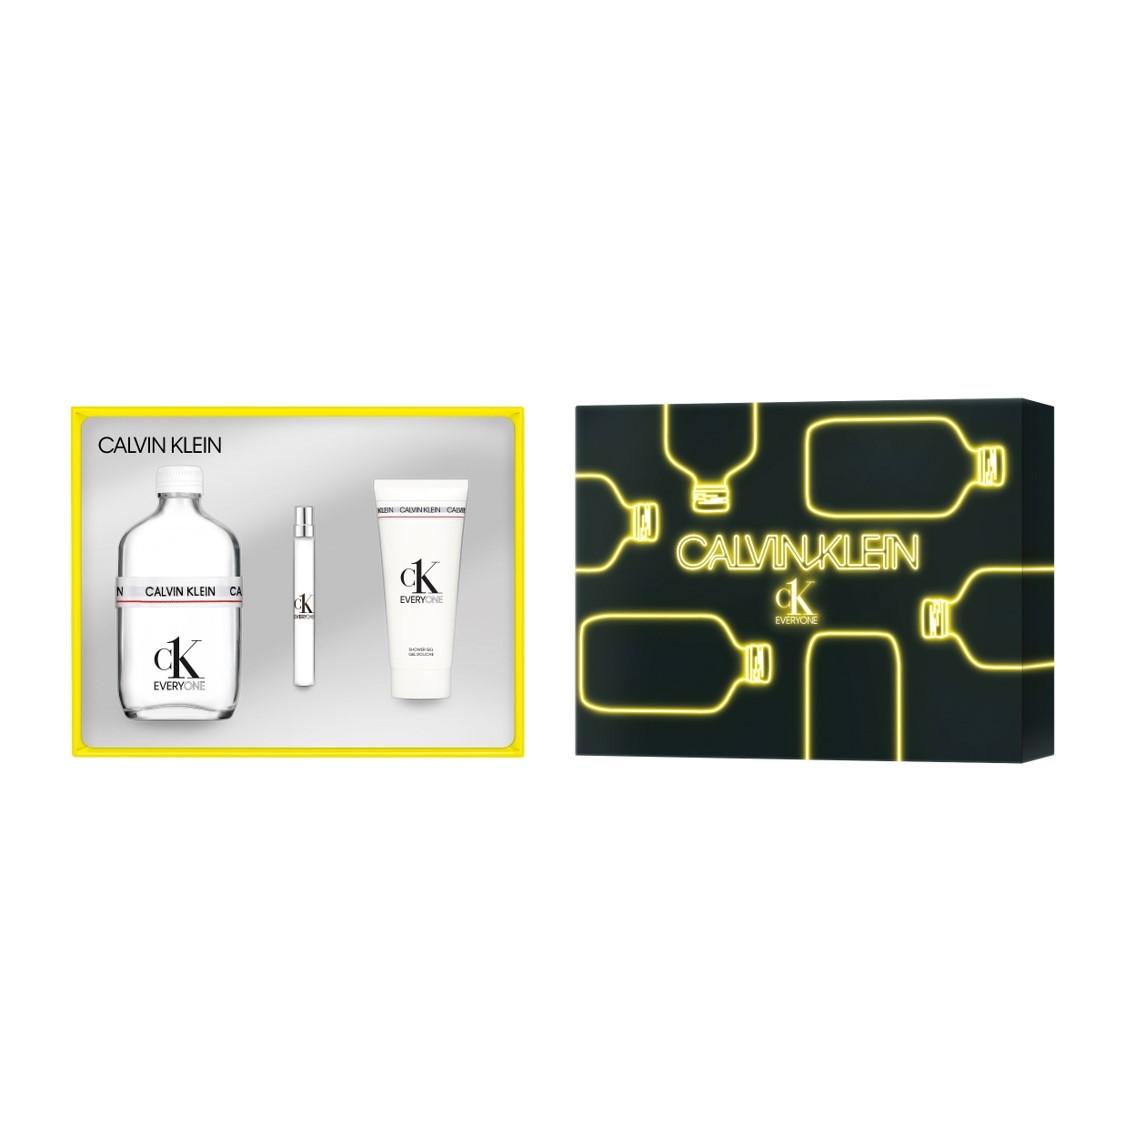 Calvin Klein - CK Everyone Eau de Toilette 200Ml Set -